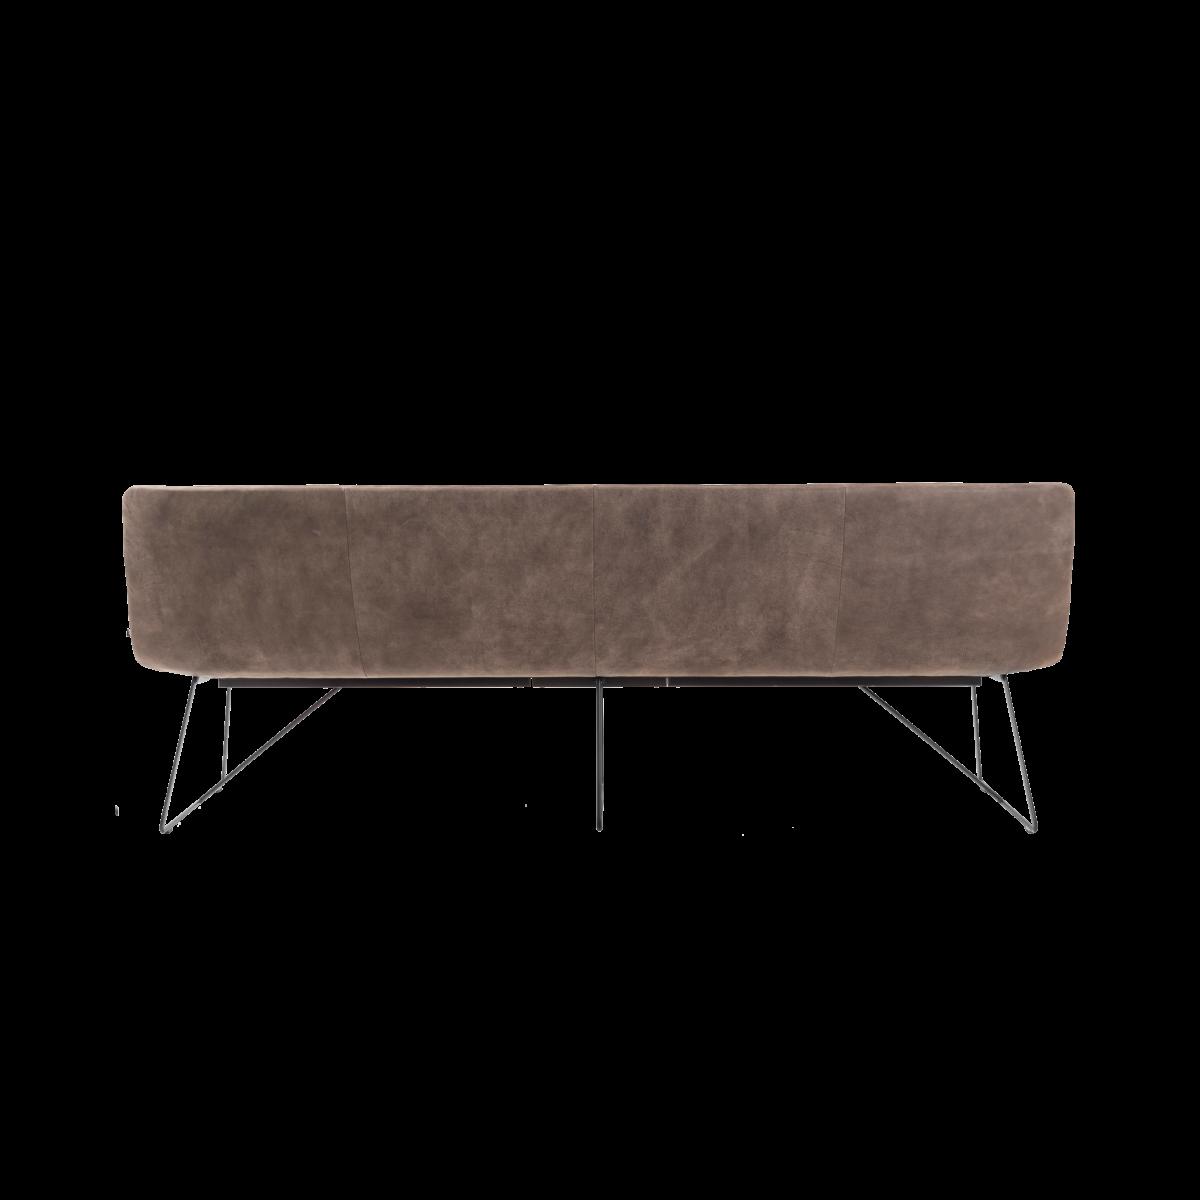 ARVA LIGHT BENCH 4er bench kuf oA pol brown KFF  5 1200x1200 - Bancheta Arva Light KFF